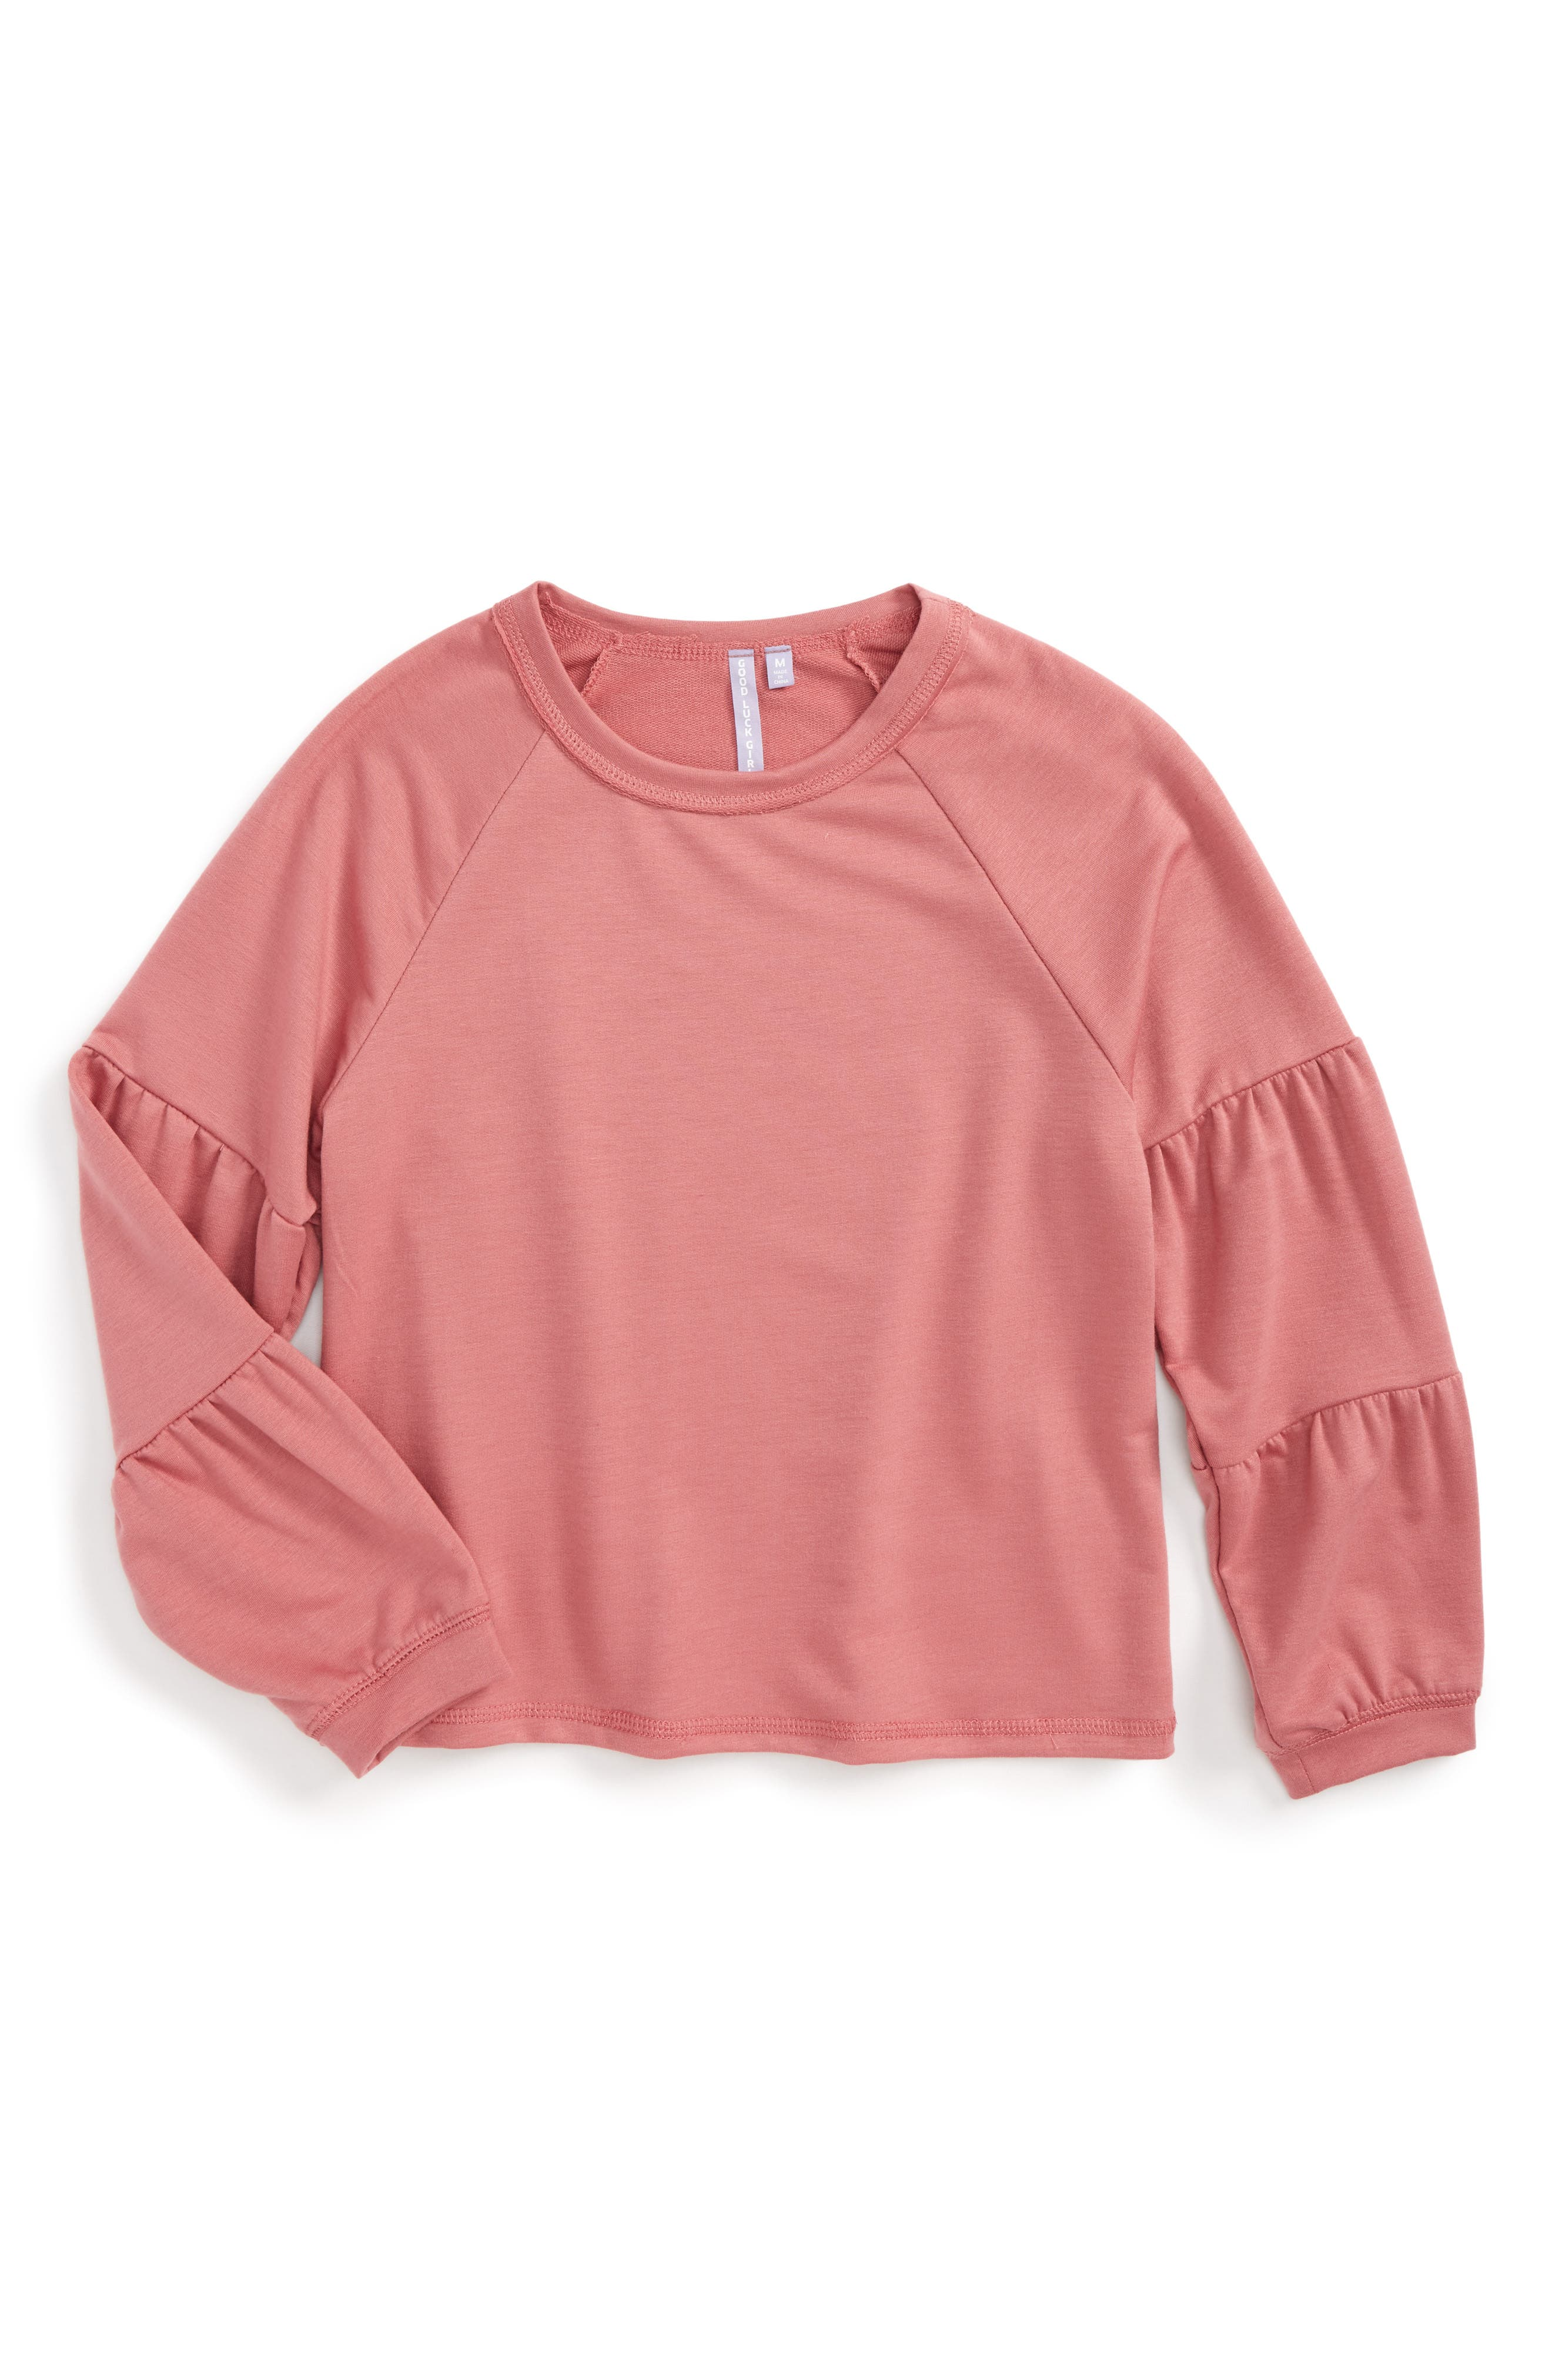 Tiered Sleeve Sweatshirt,                             Main thumbnail 1, color,                             551